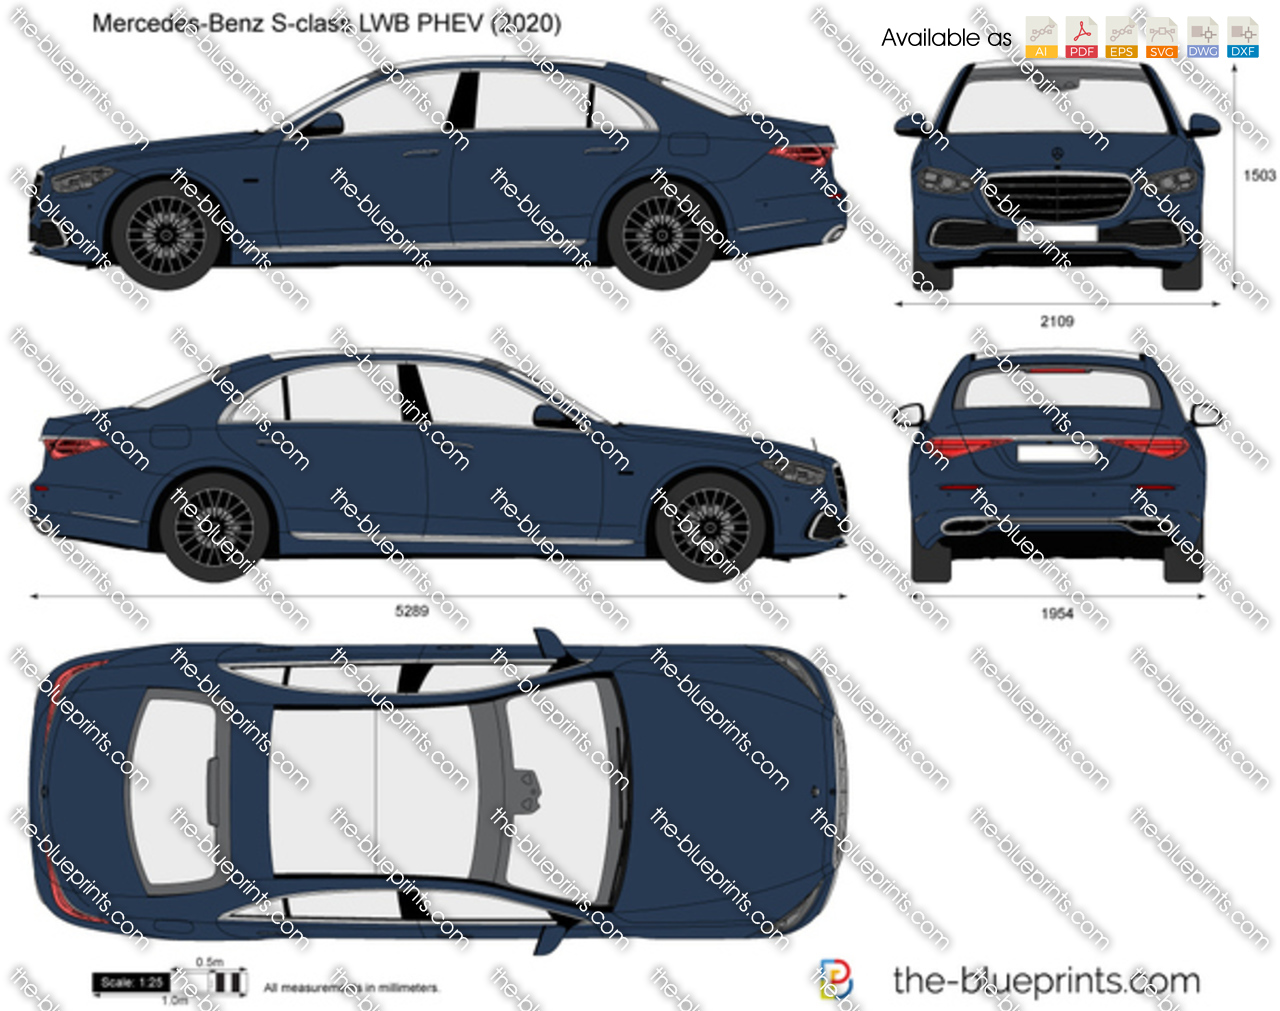 Mercedes-Benz S-class LWB PHEV W223